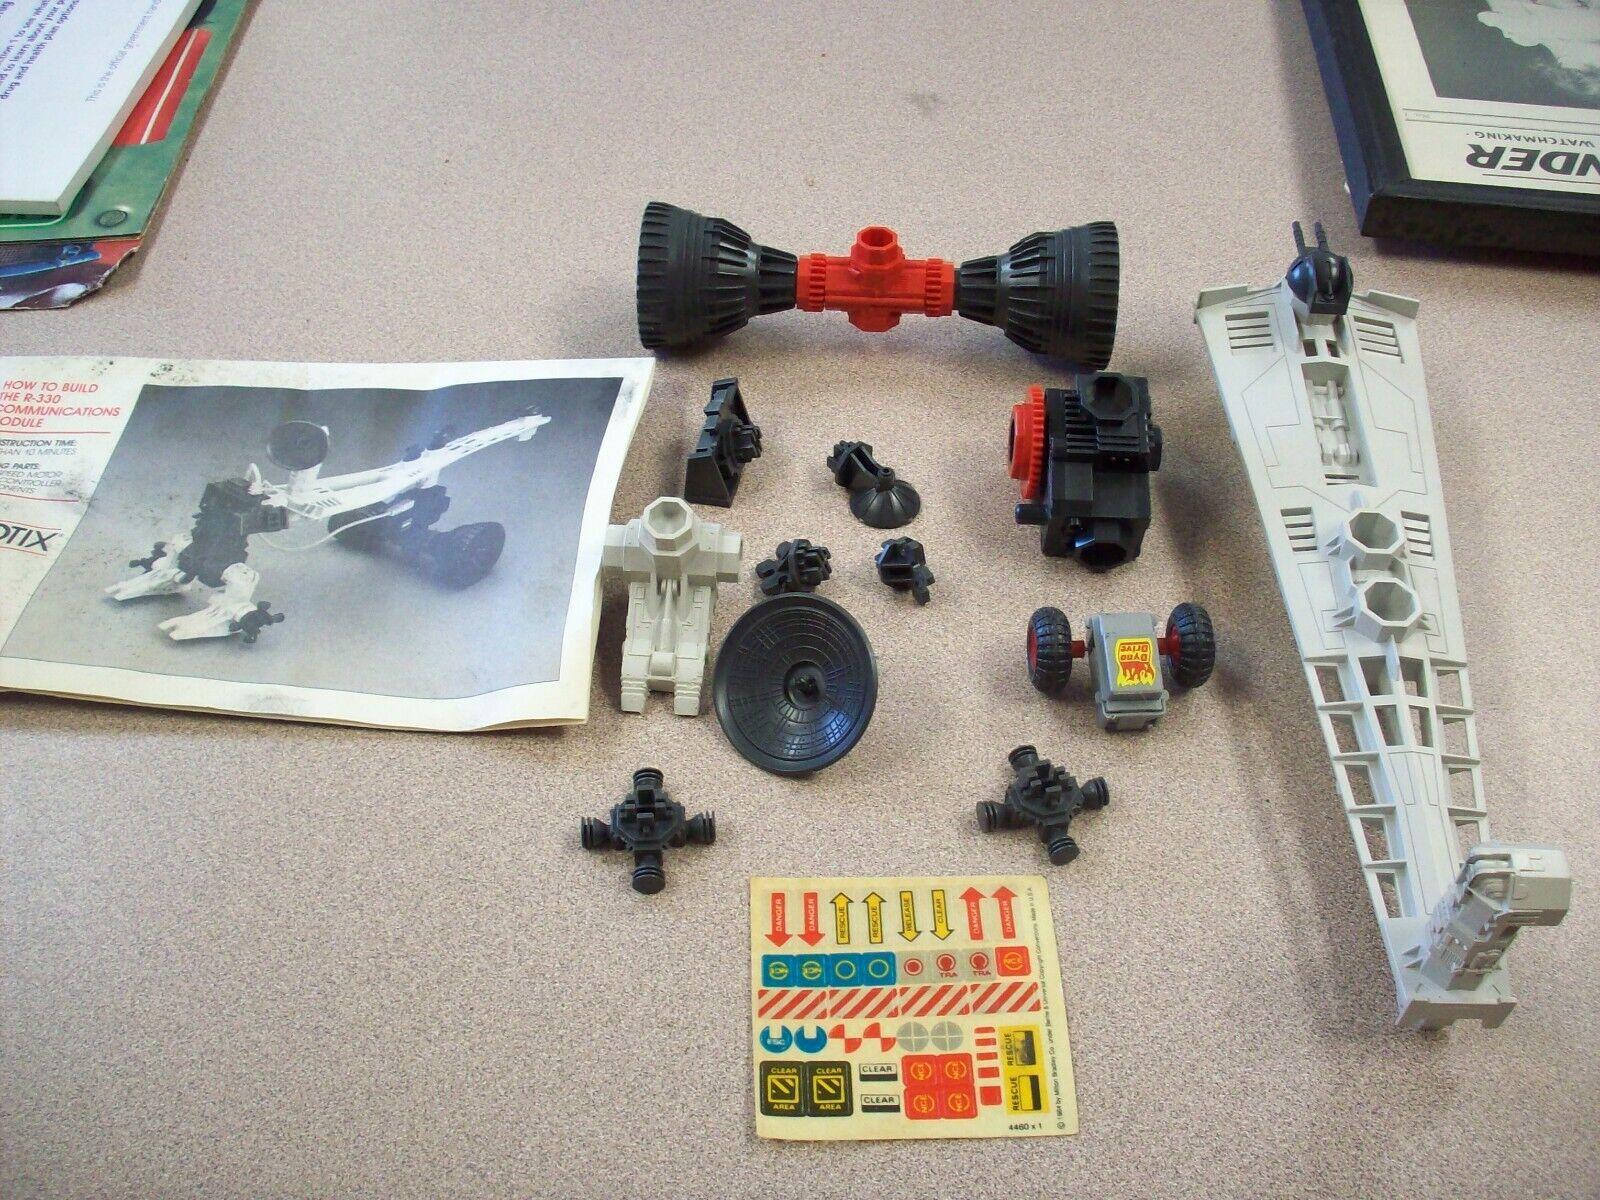 Vintage Milton Brabley Robotix series R-330 with box